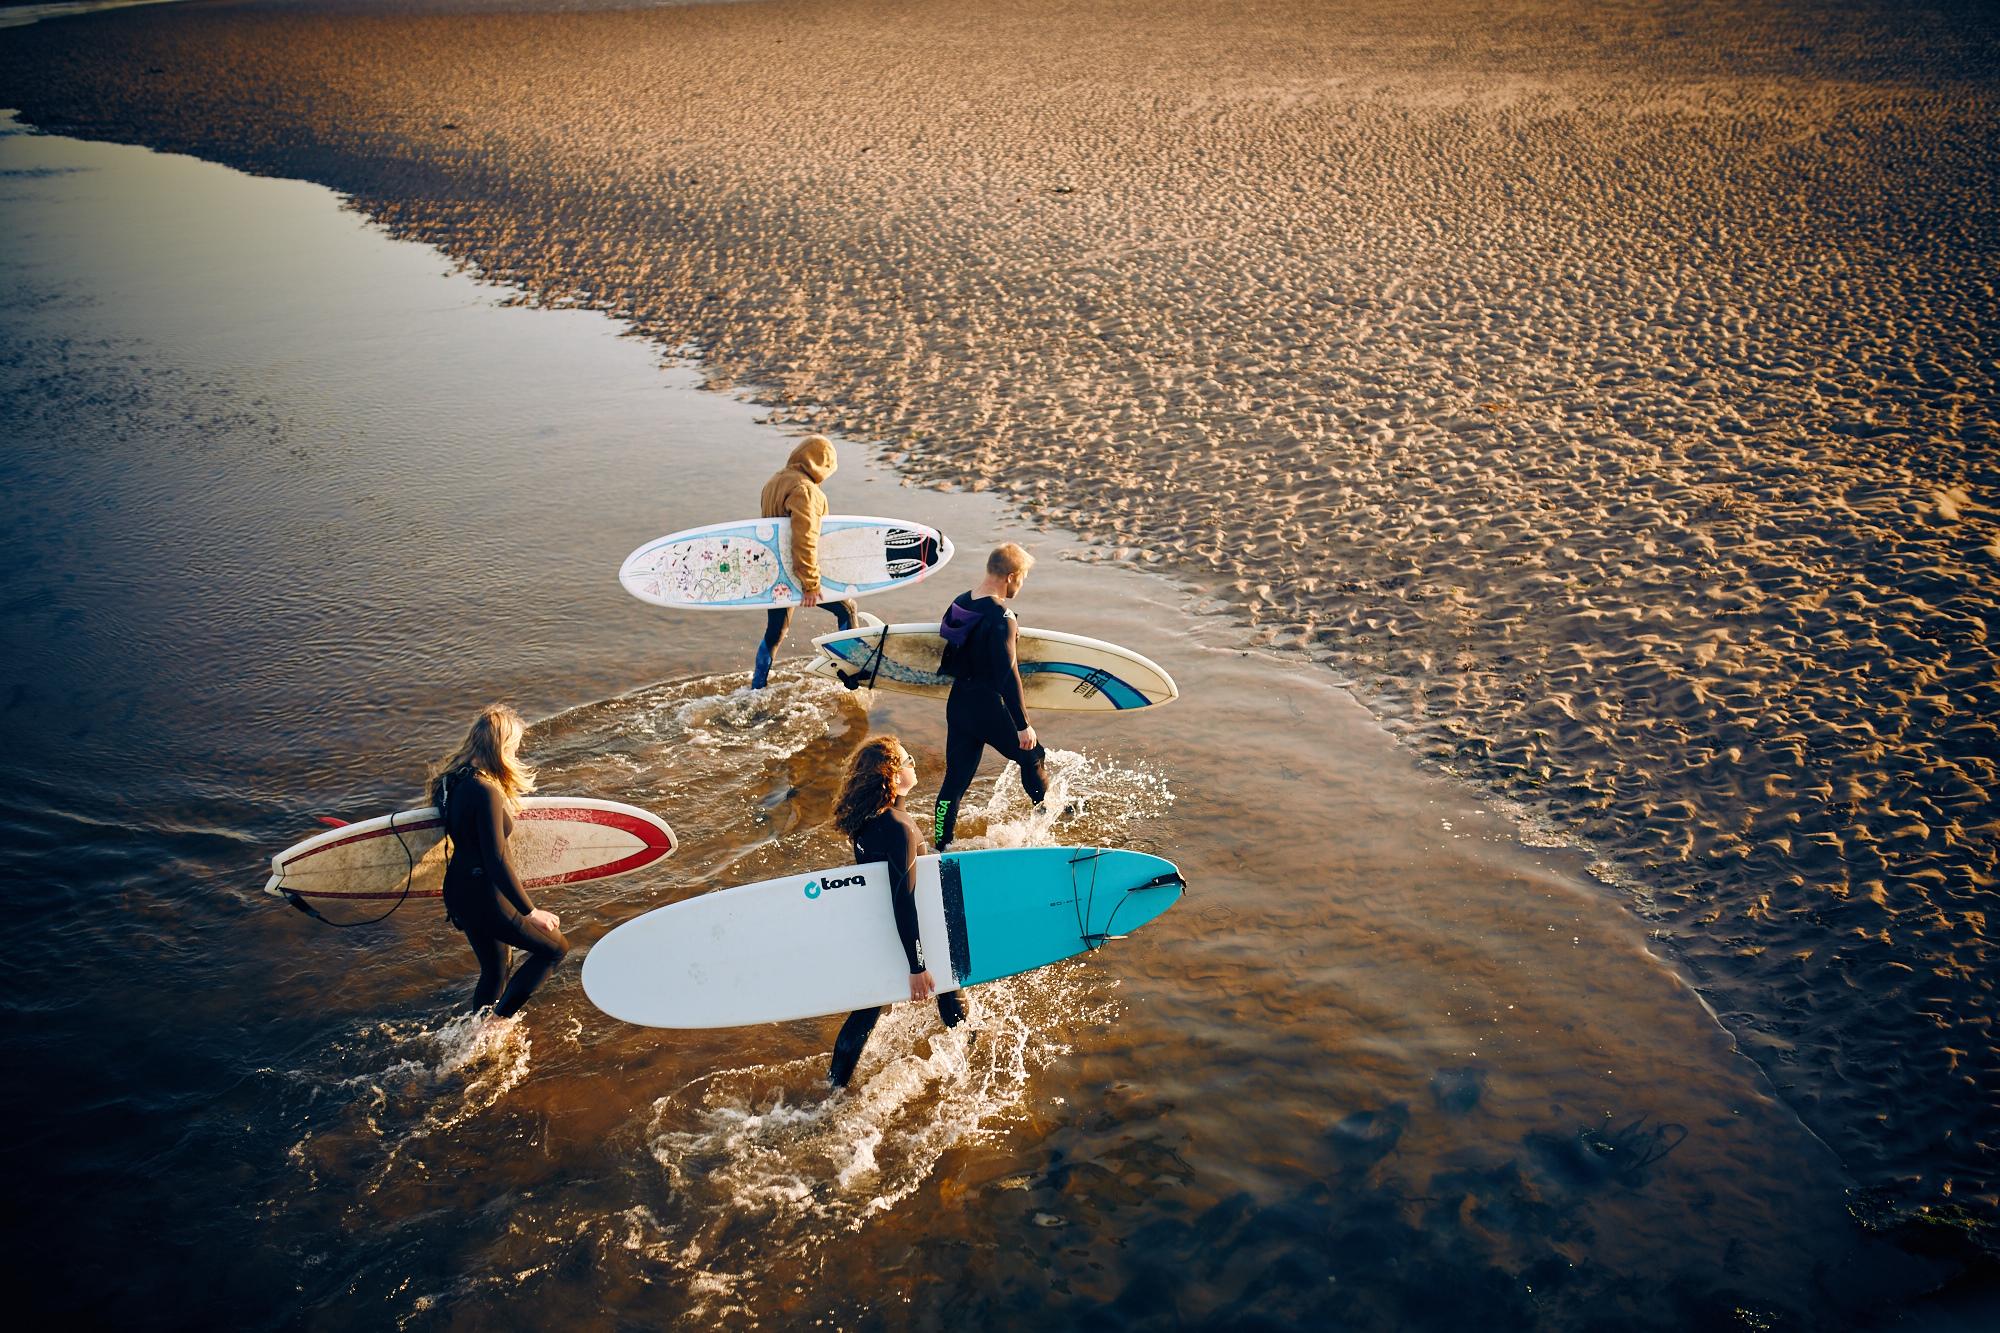 surf lyfestyle 862.jpg